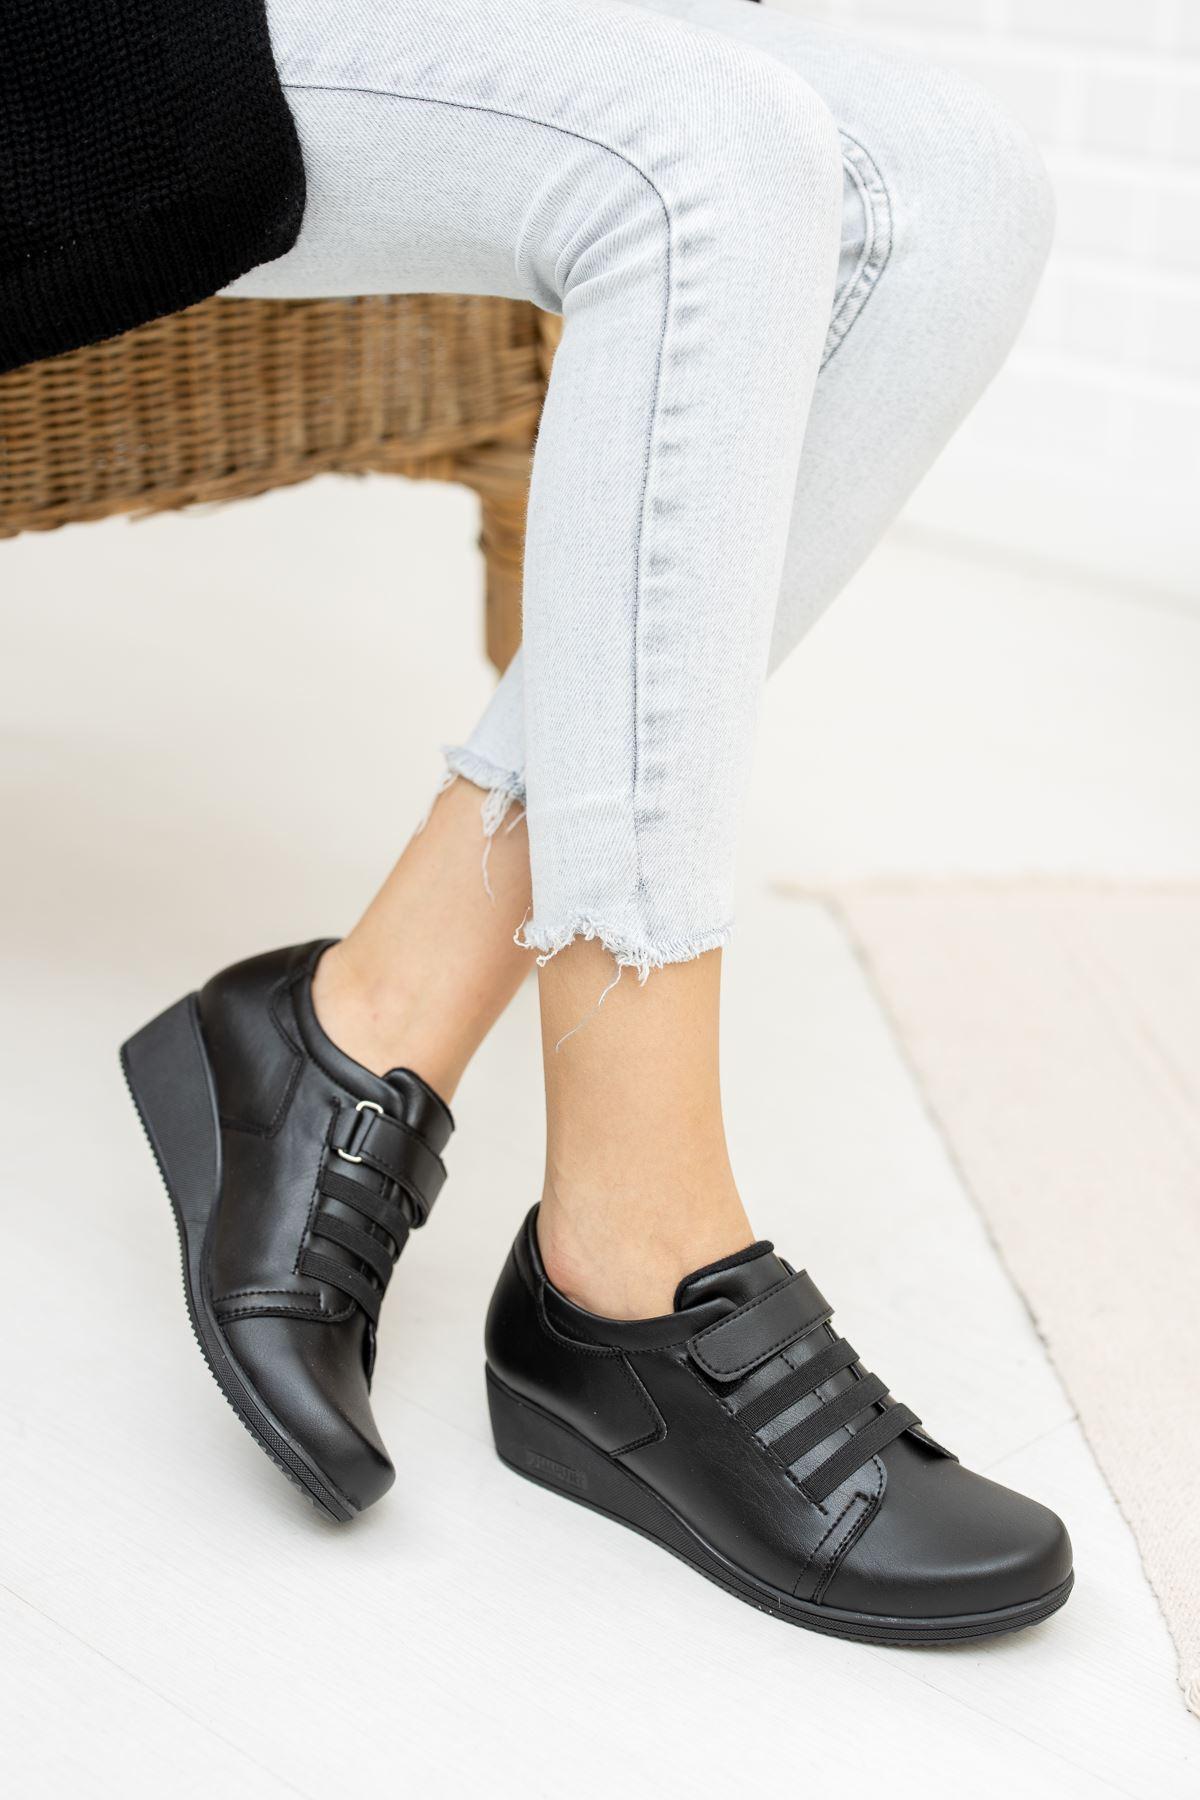 Cırtlı 3 Lastikli Ortapedik Pedli Siyah Cilt Ayakkabı